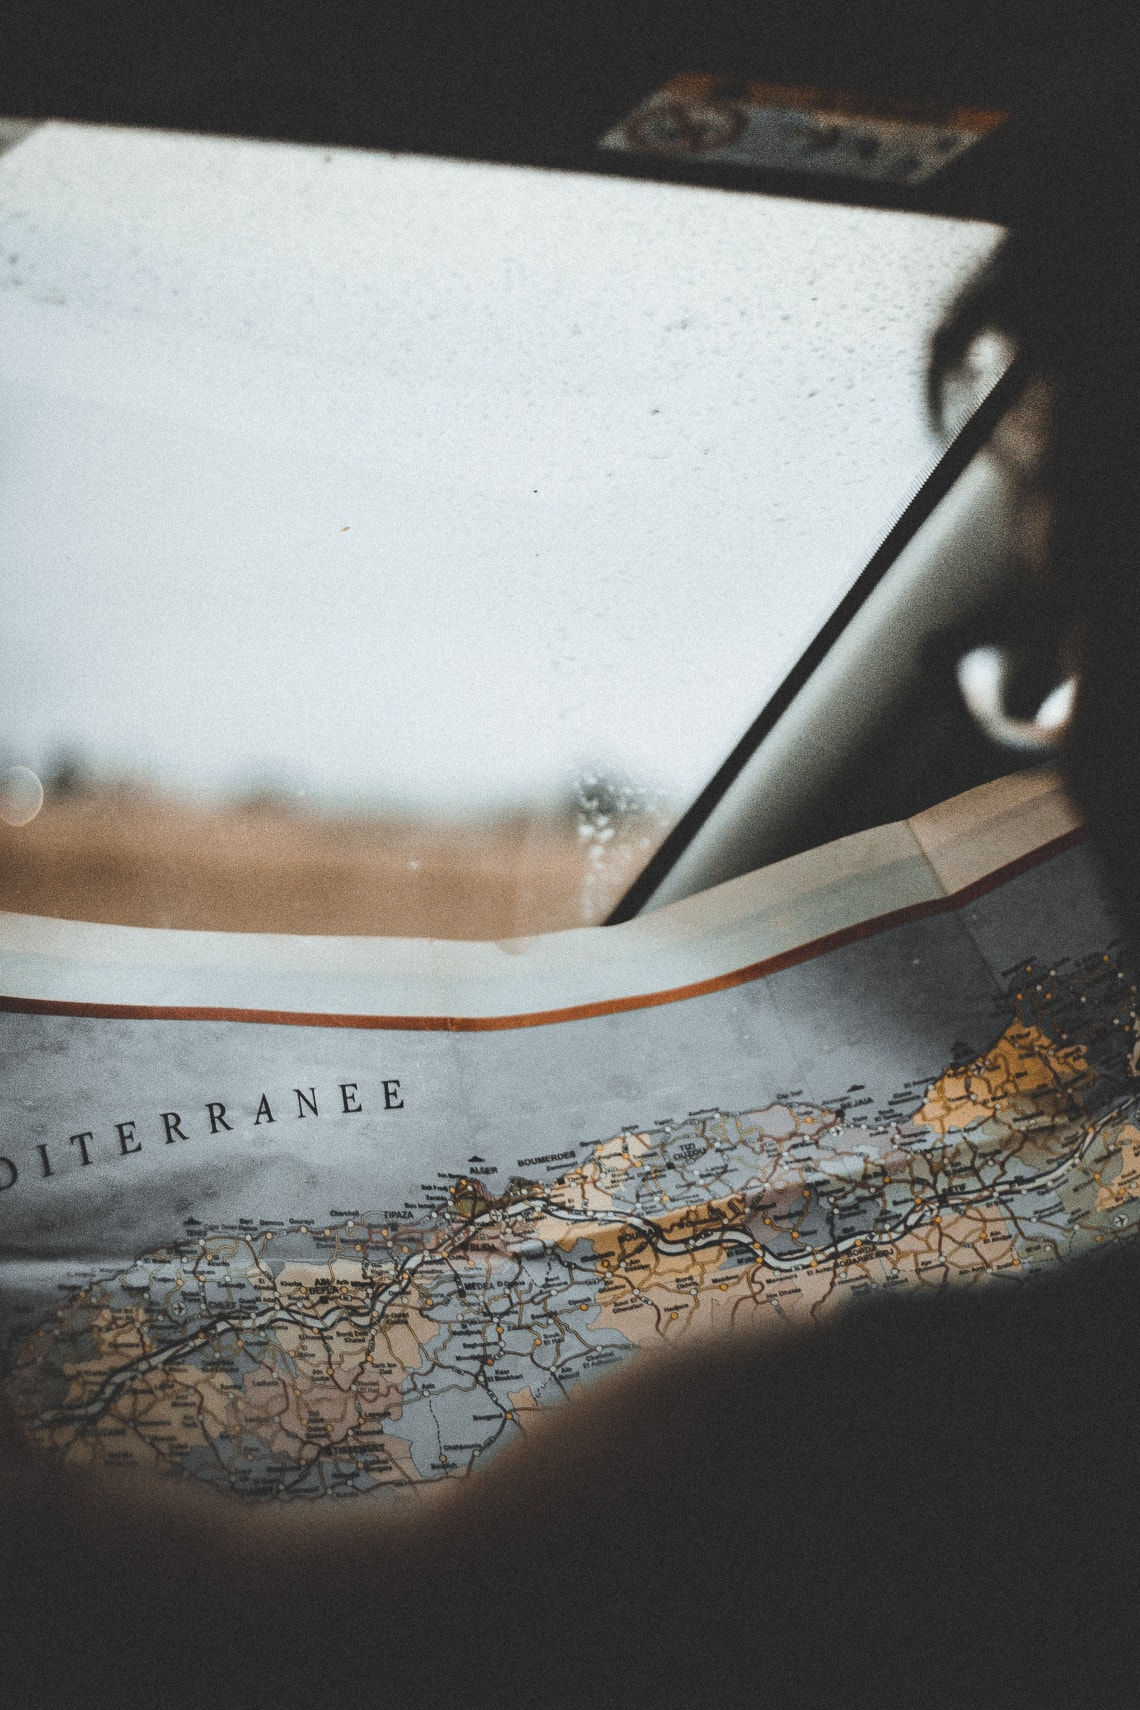 Traveler looking at vintage map